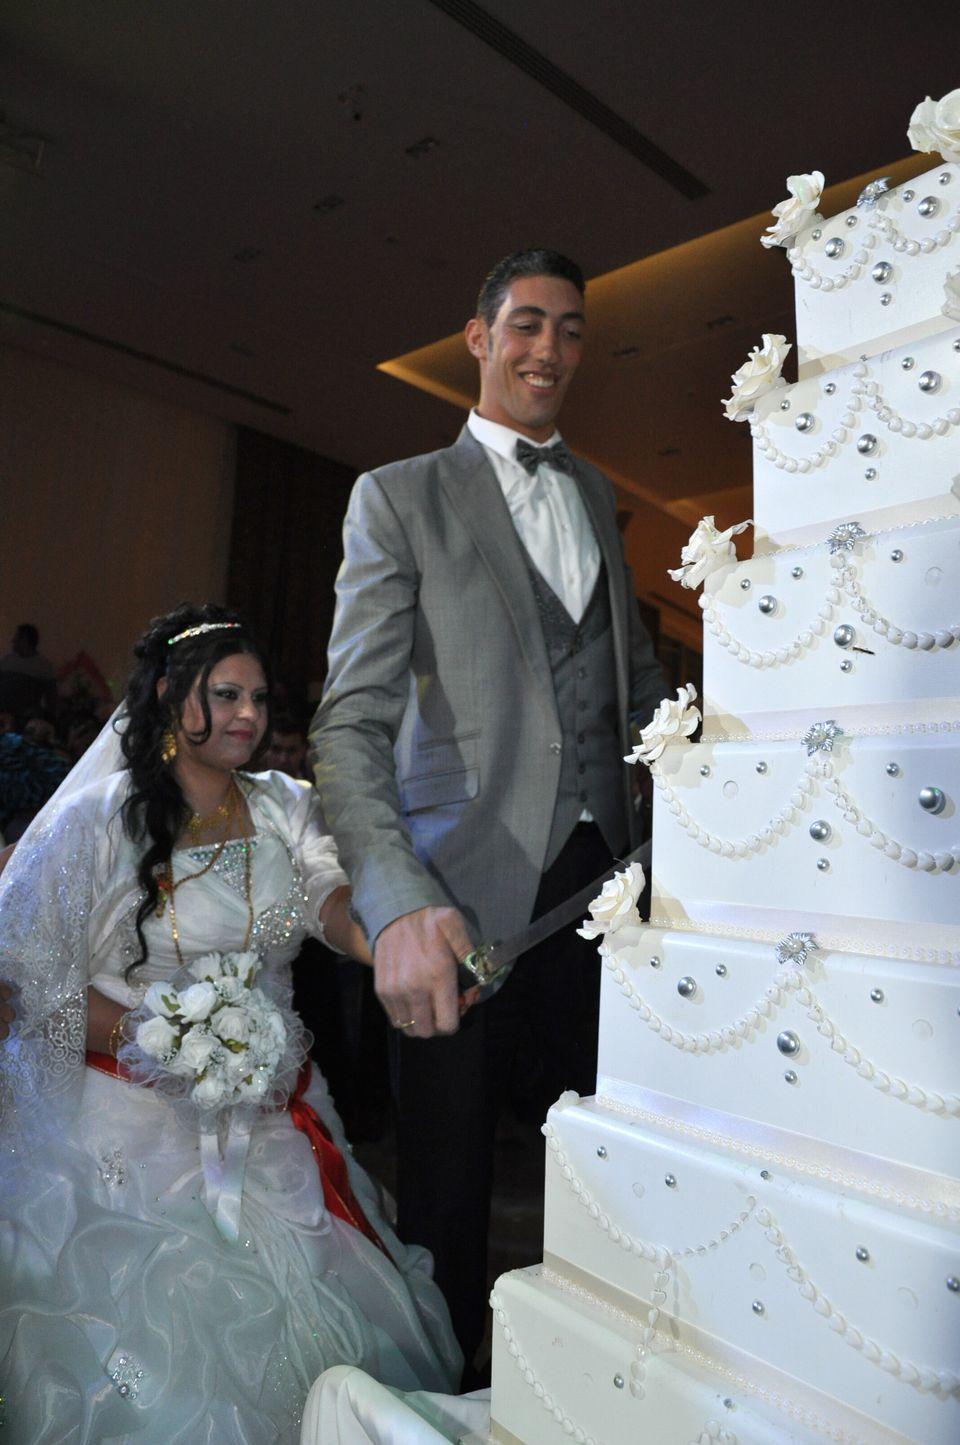 The world's tallest man Sultan Kosen (R) and his bride cut their wedding cake on October 27, 2013 in Mardin during their wedd